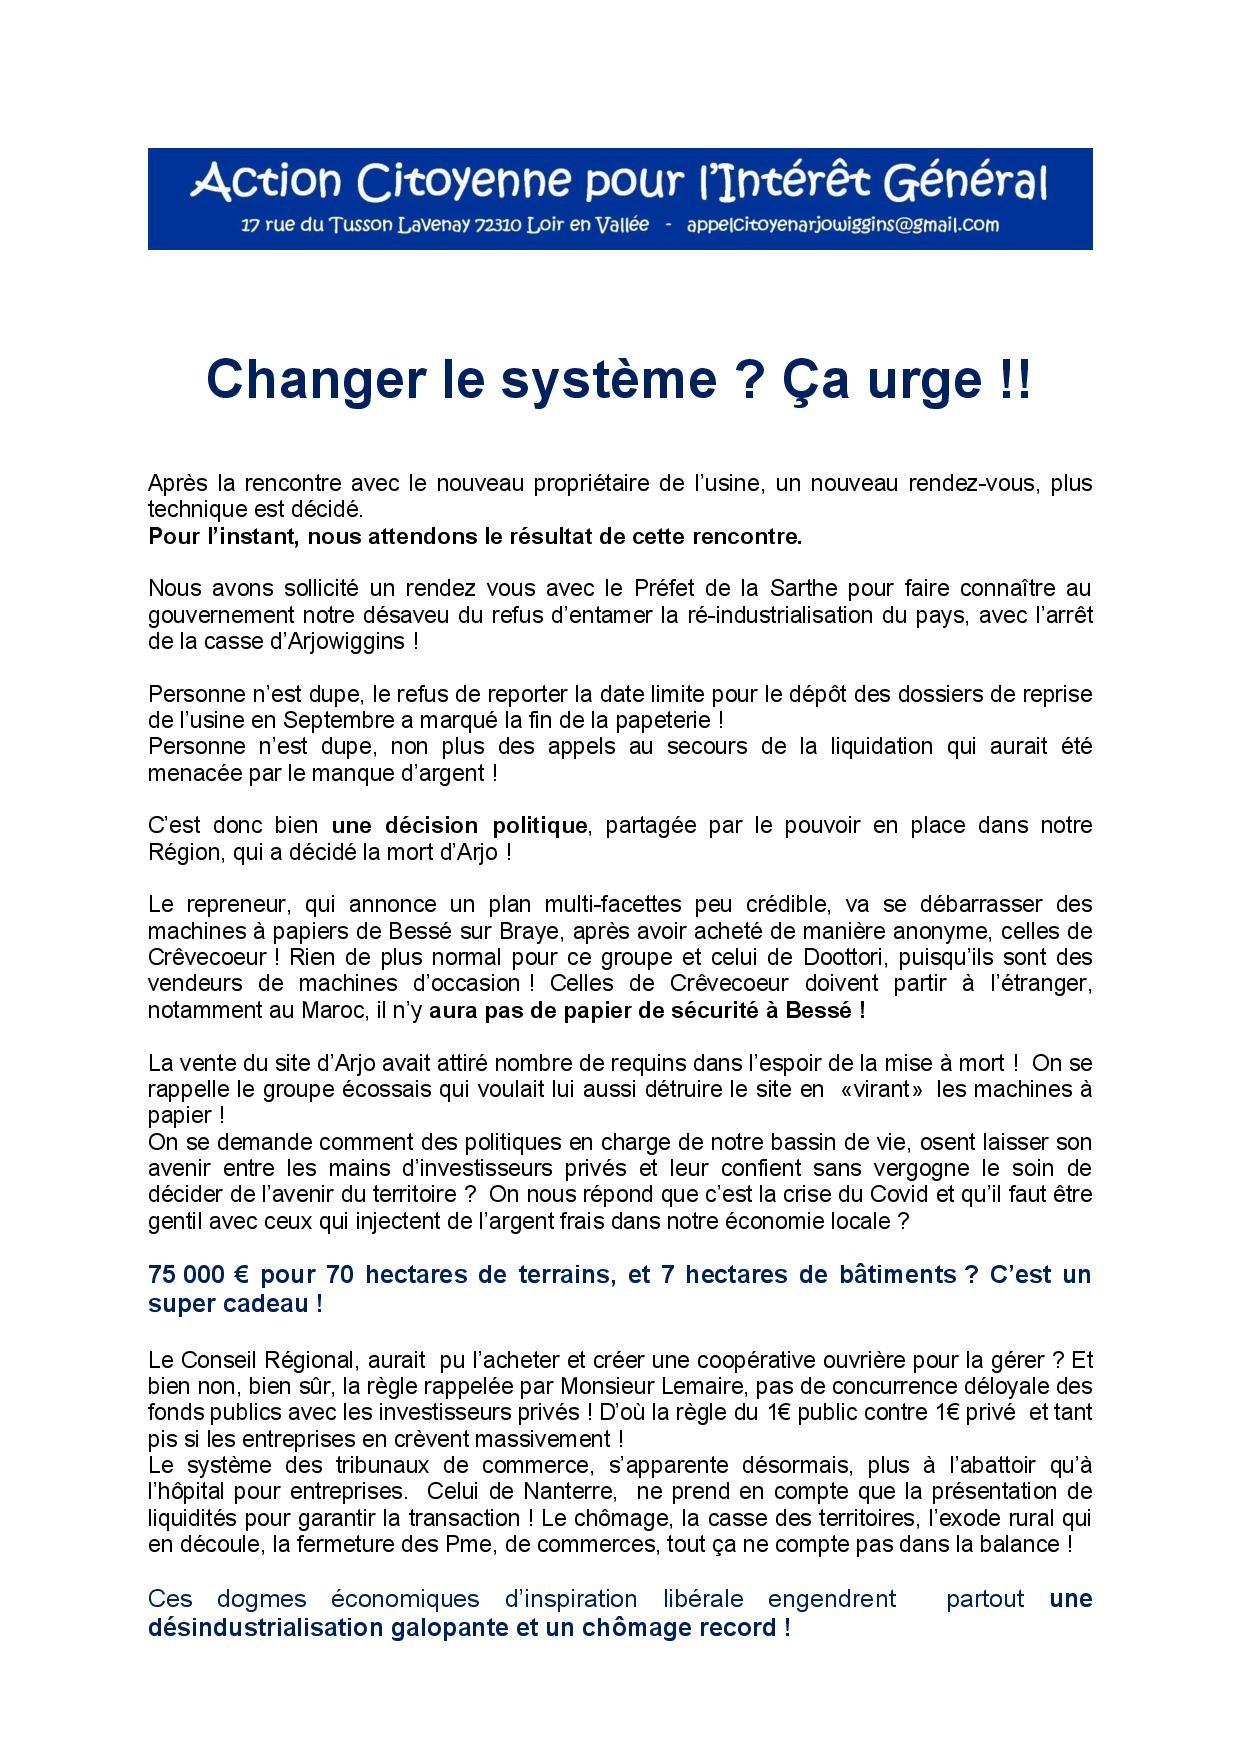 Changer le systeme ca urge 050720-1